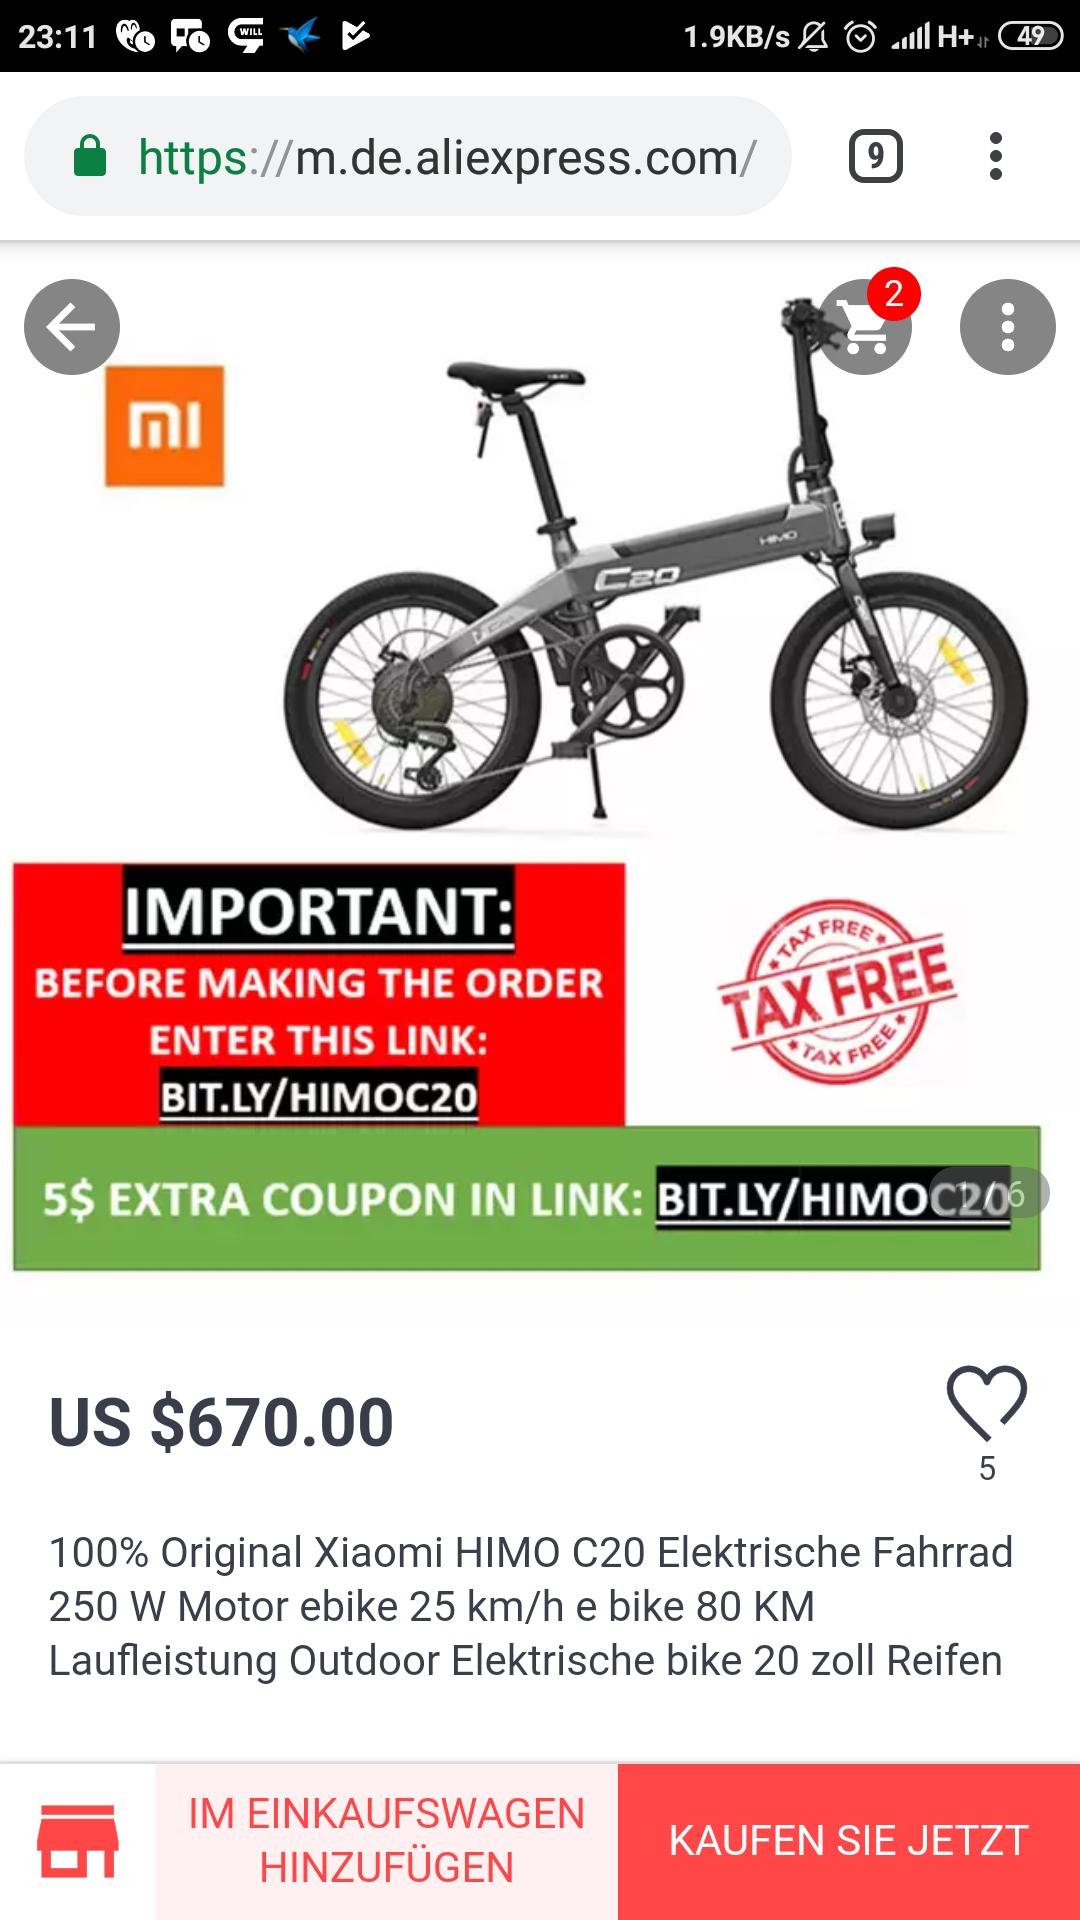 HIMO C20 Falt e Bike, Nachfolger von Qicycle EF1, Fahrrad